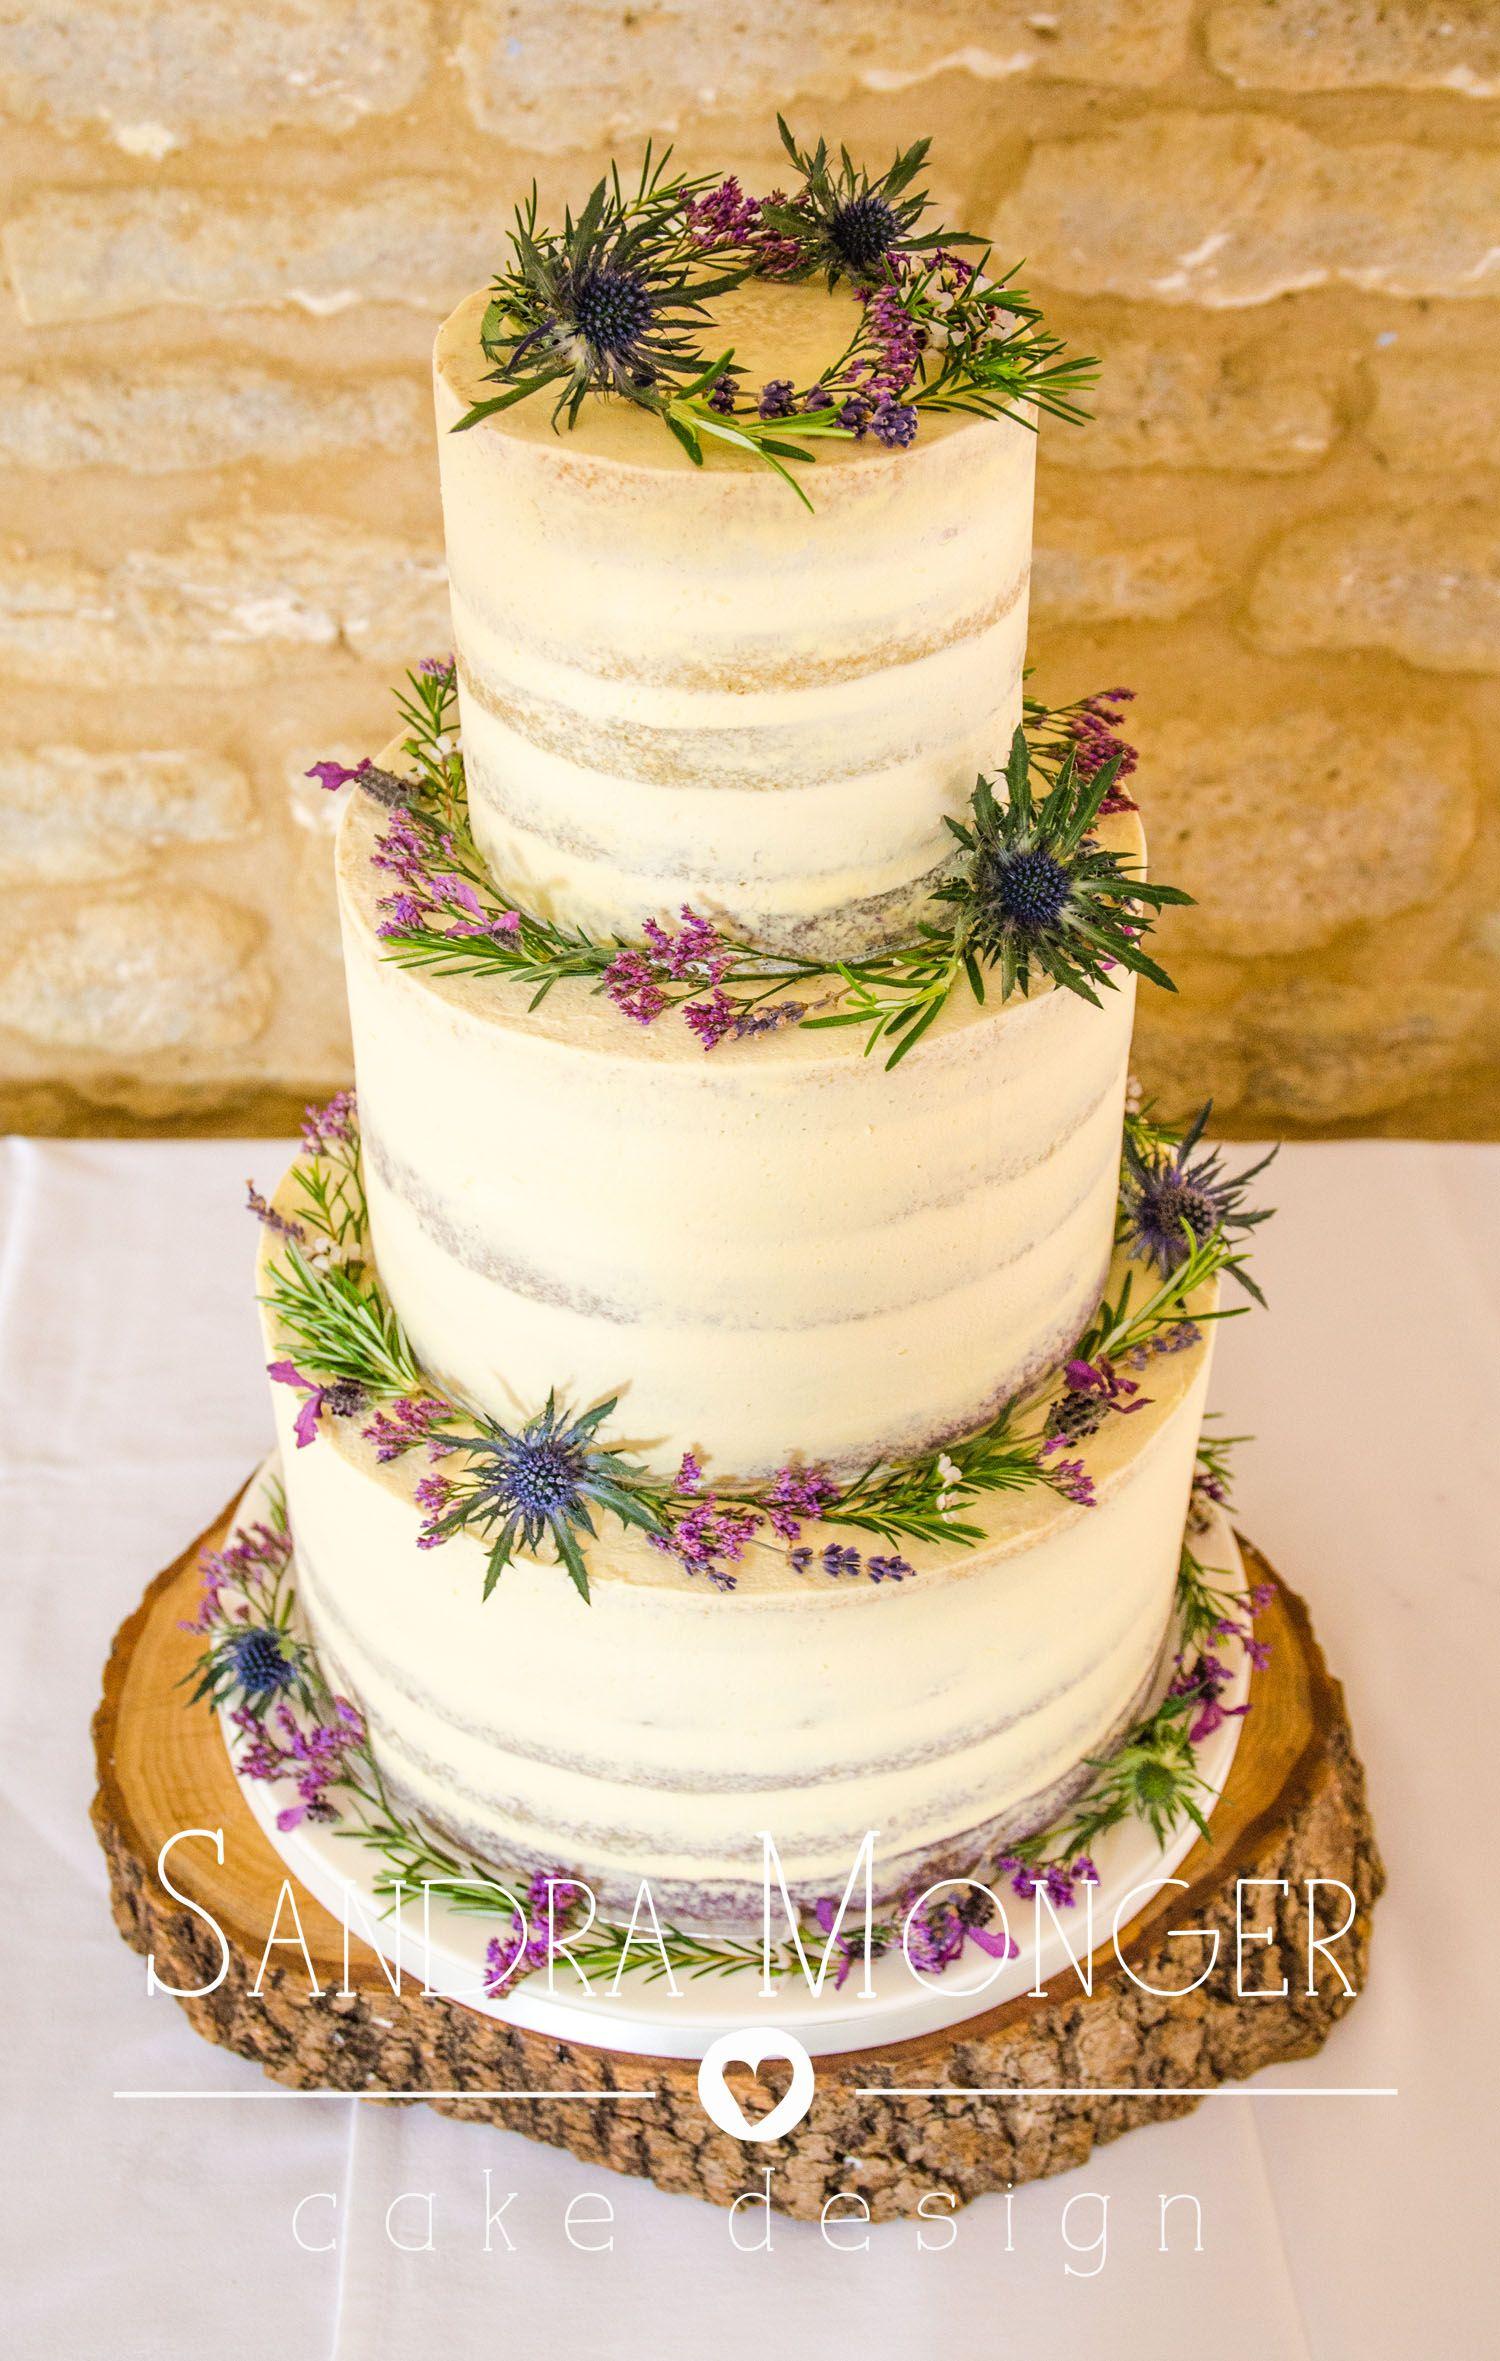 A beautiful Vegan rose water wedding cake with fresh flowers ...